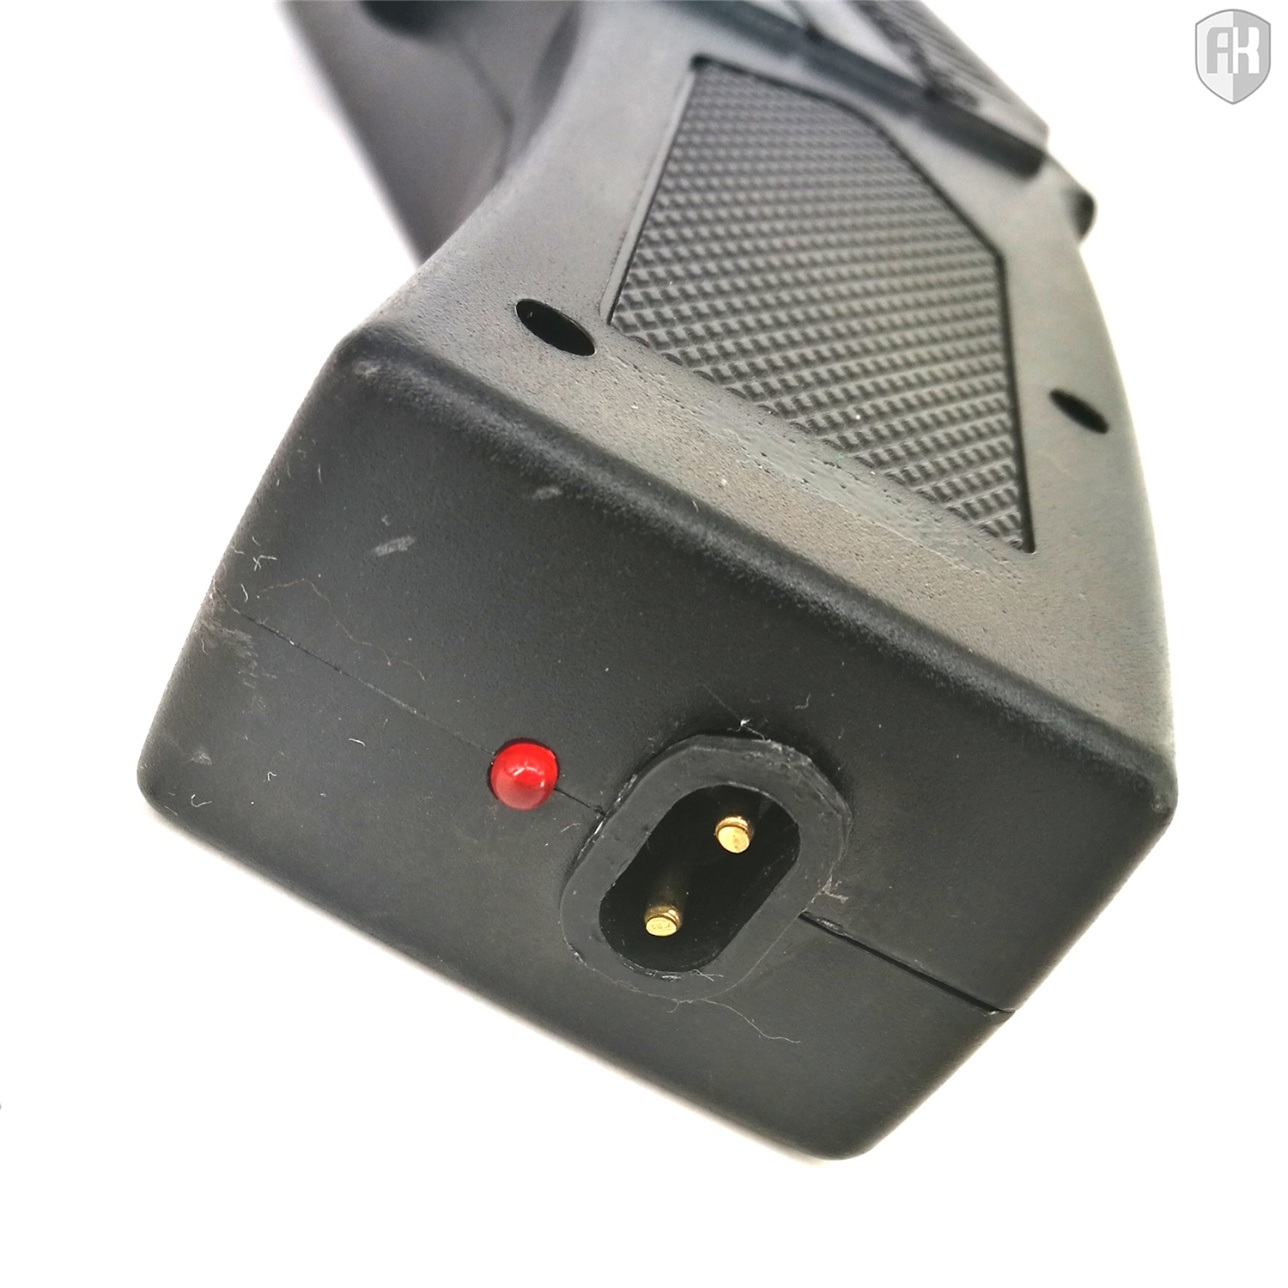 Police Long Distance Stun Gun Manufacturer (5M)